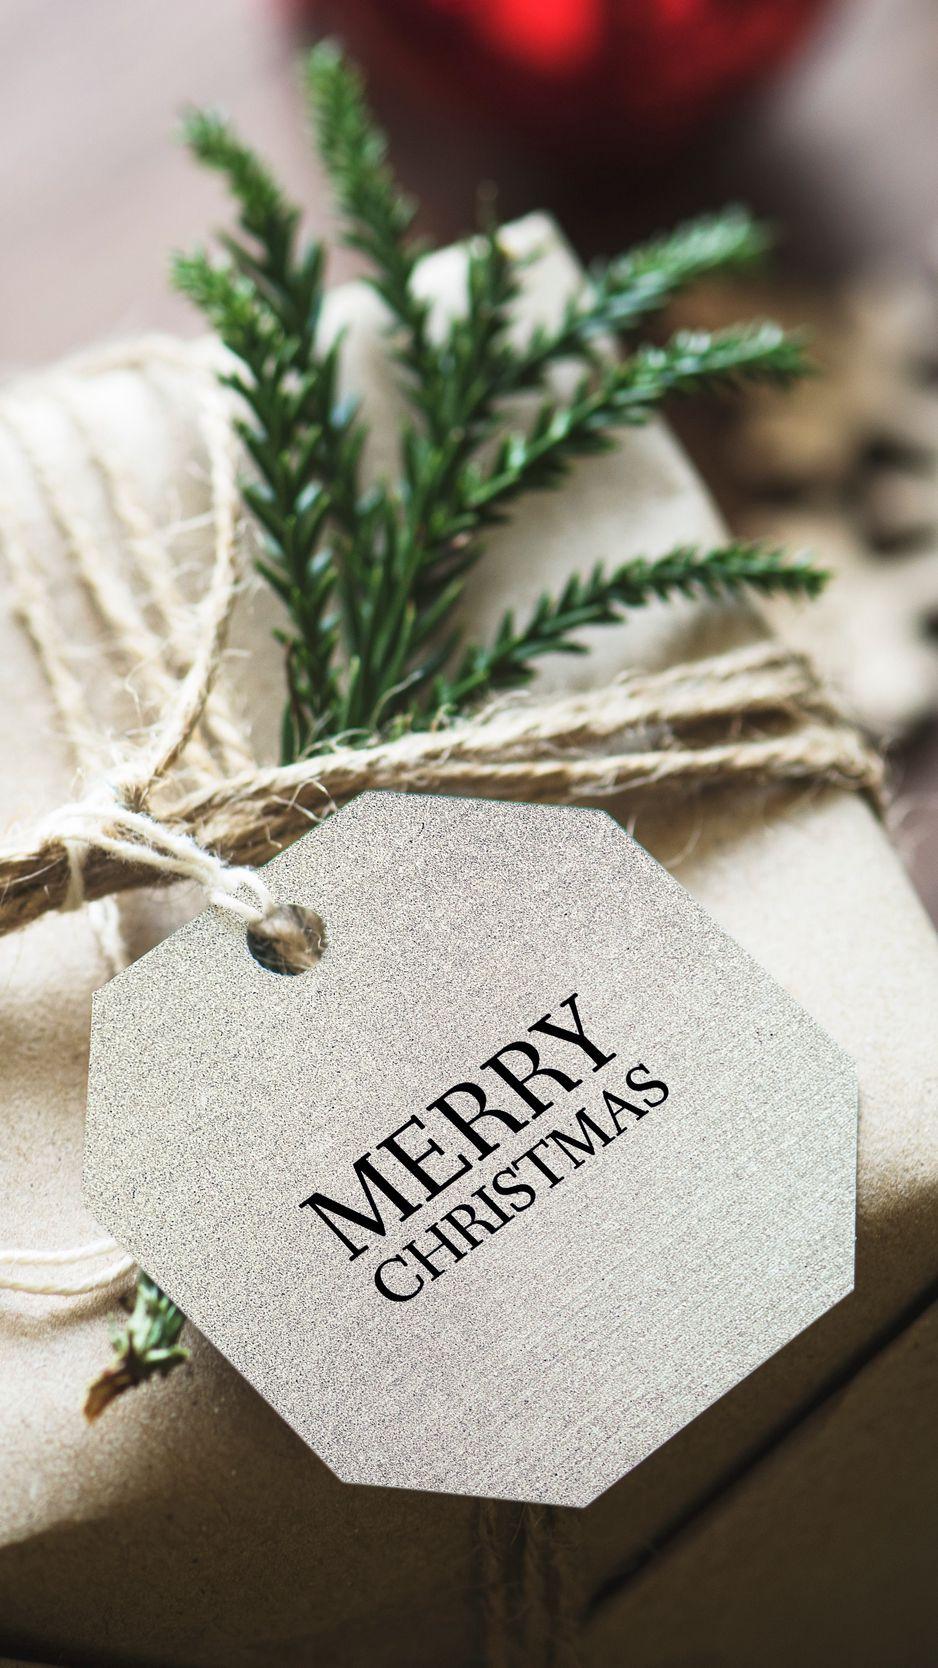 938x1668 Wallpaper gift, christmas, new year, tag, box